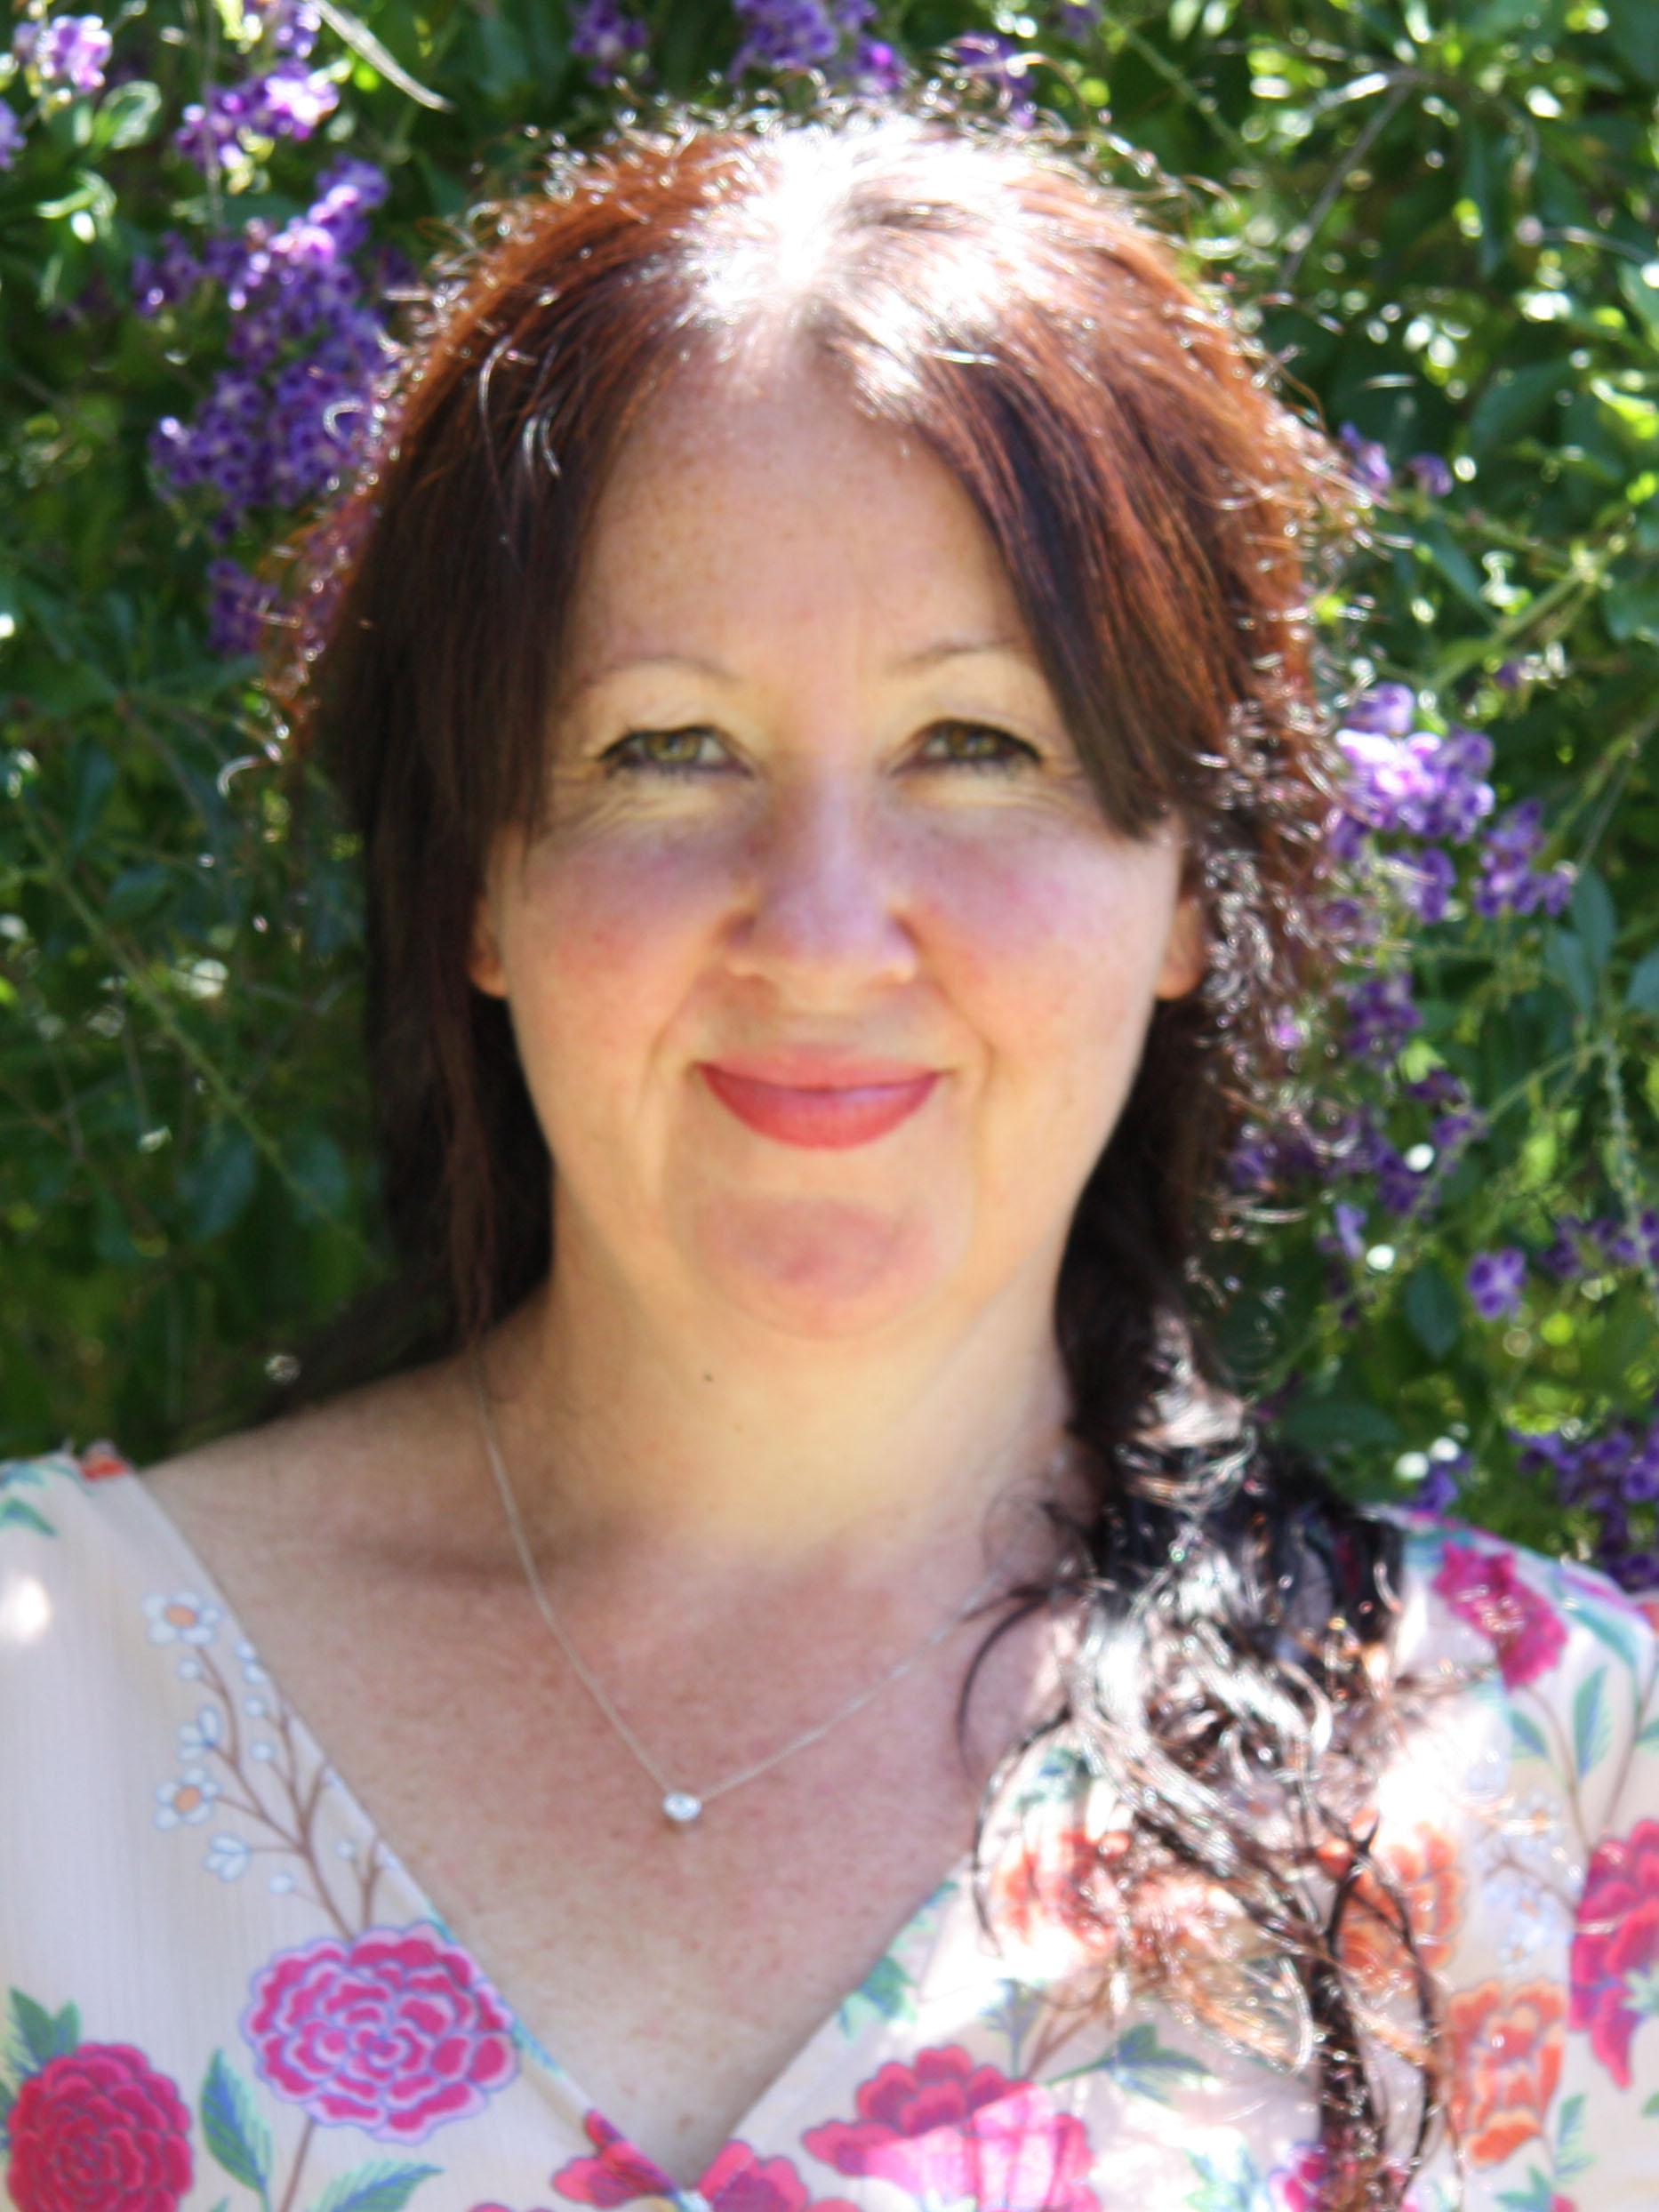 Naturopath Susan Doumtsis